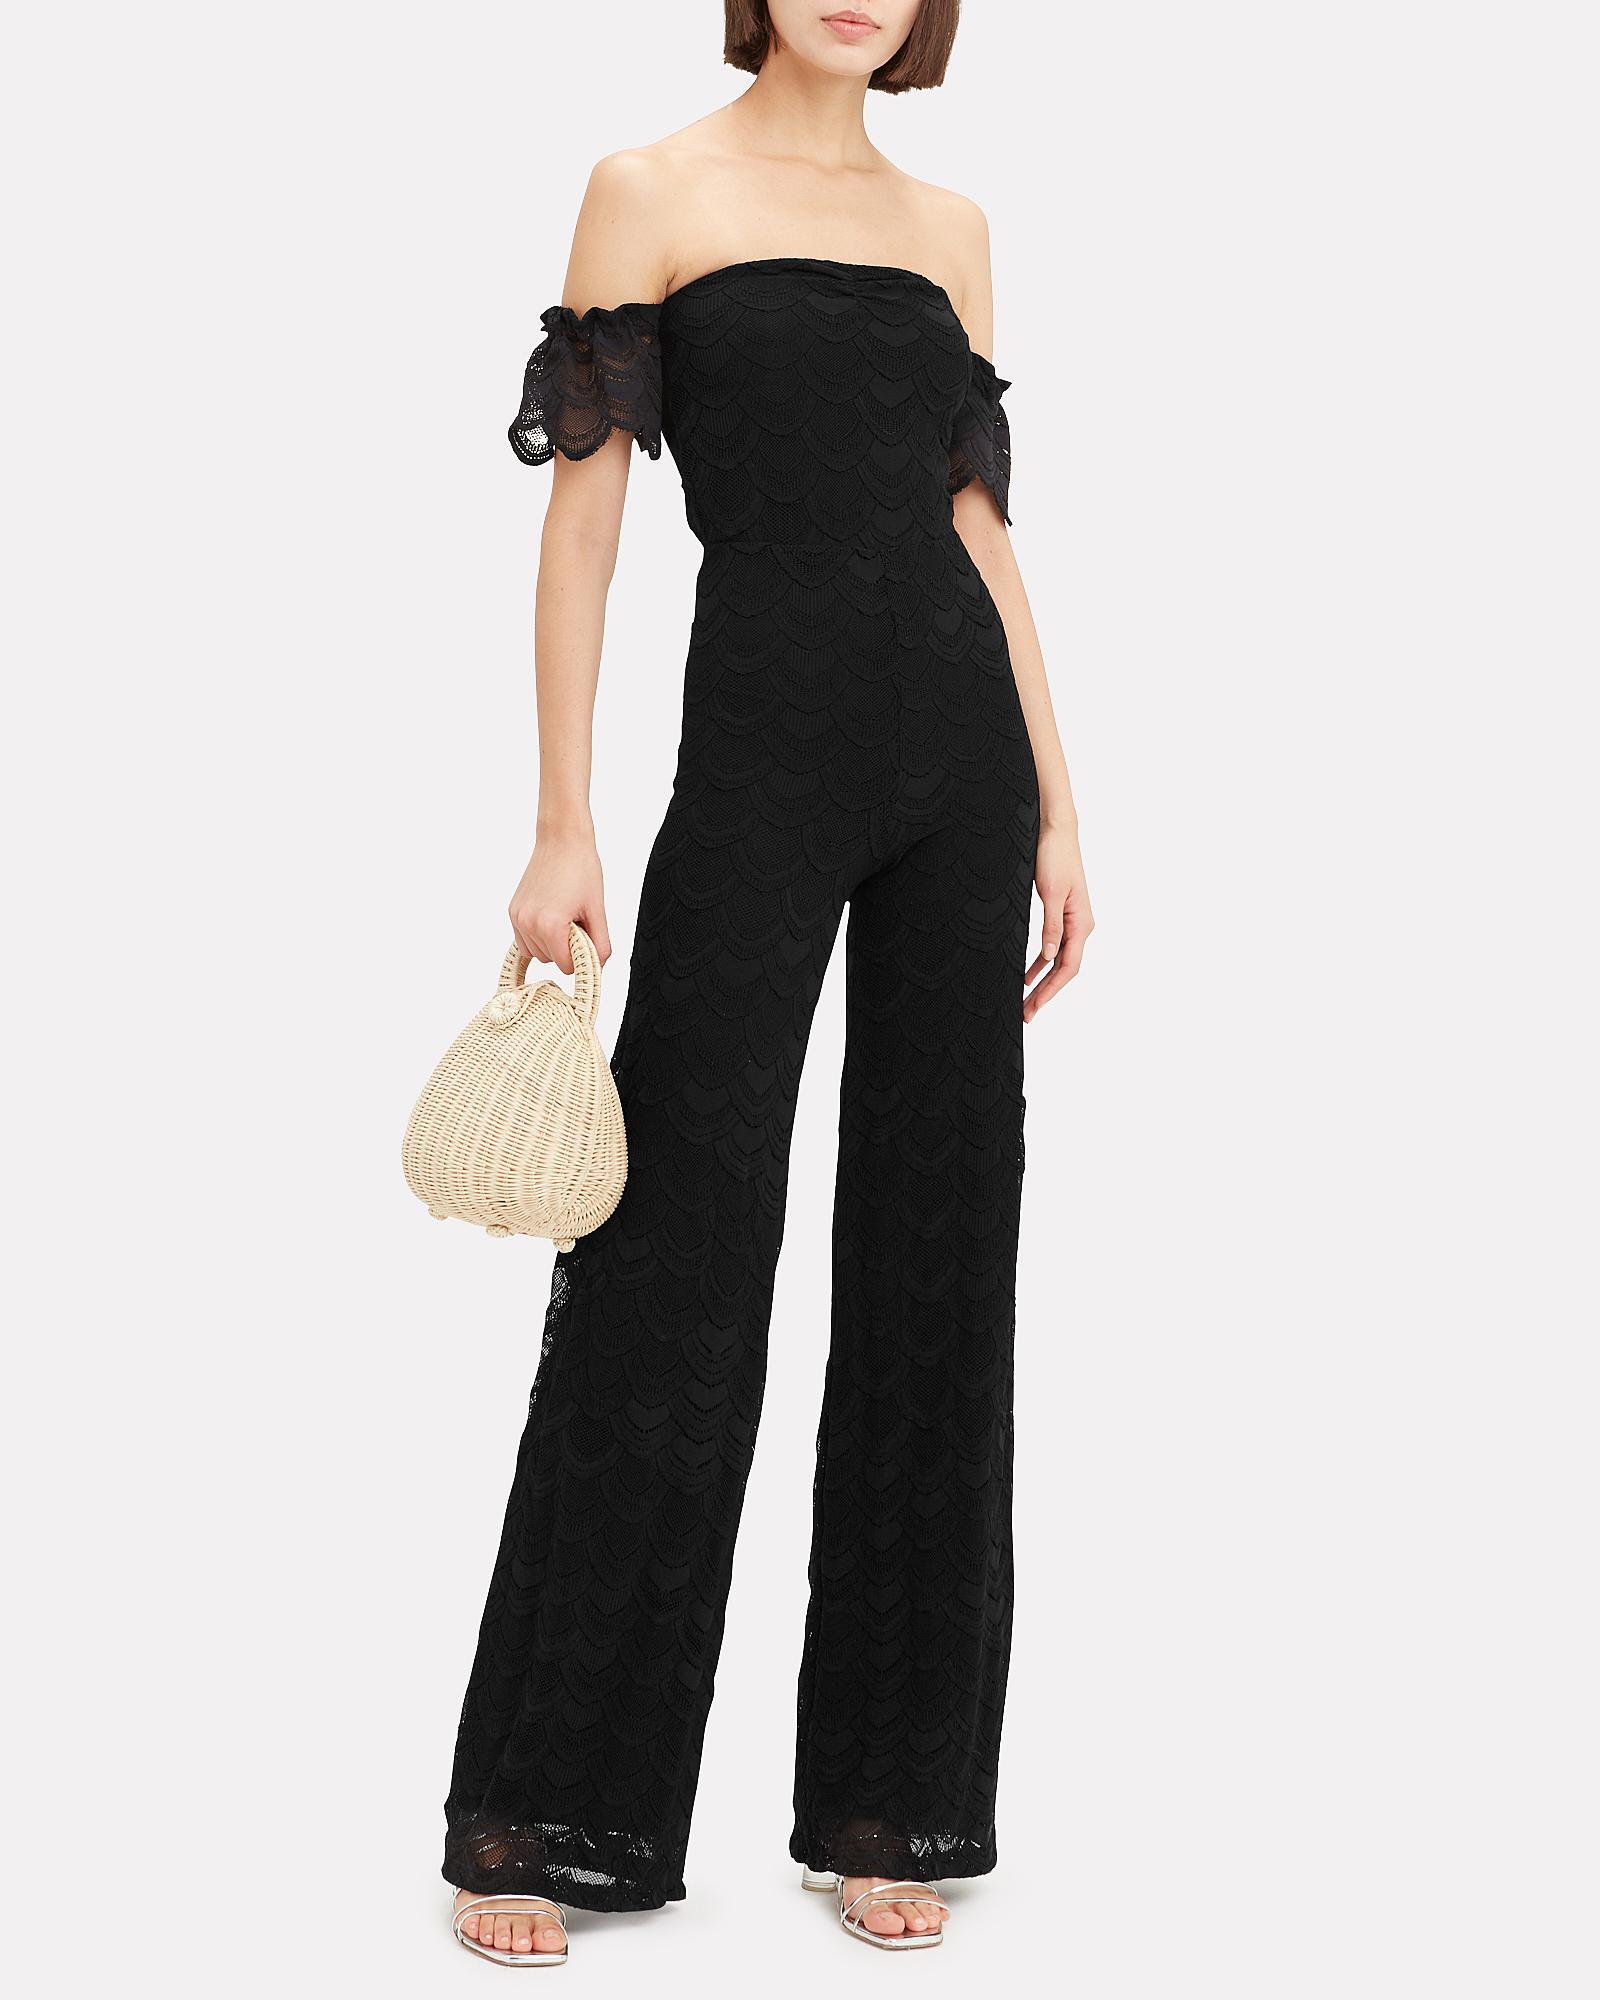 e9d5925fa4d Lyst - Nightcap Victorian Flutter Jumpsuit in Black